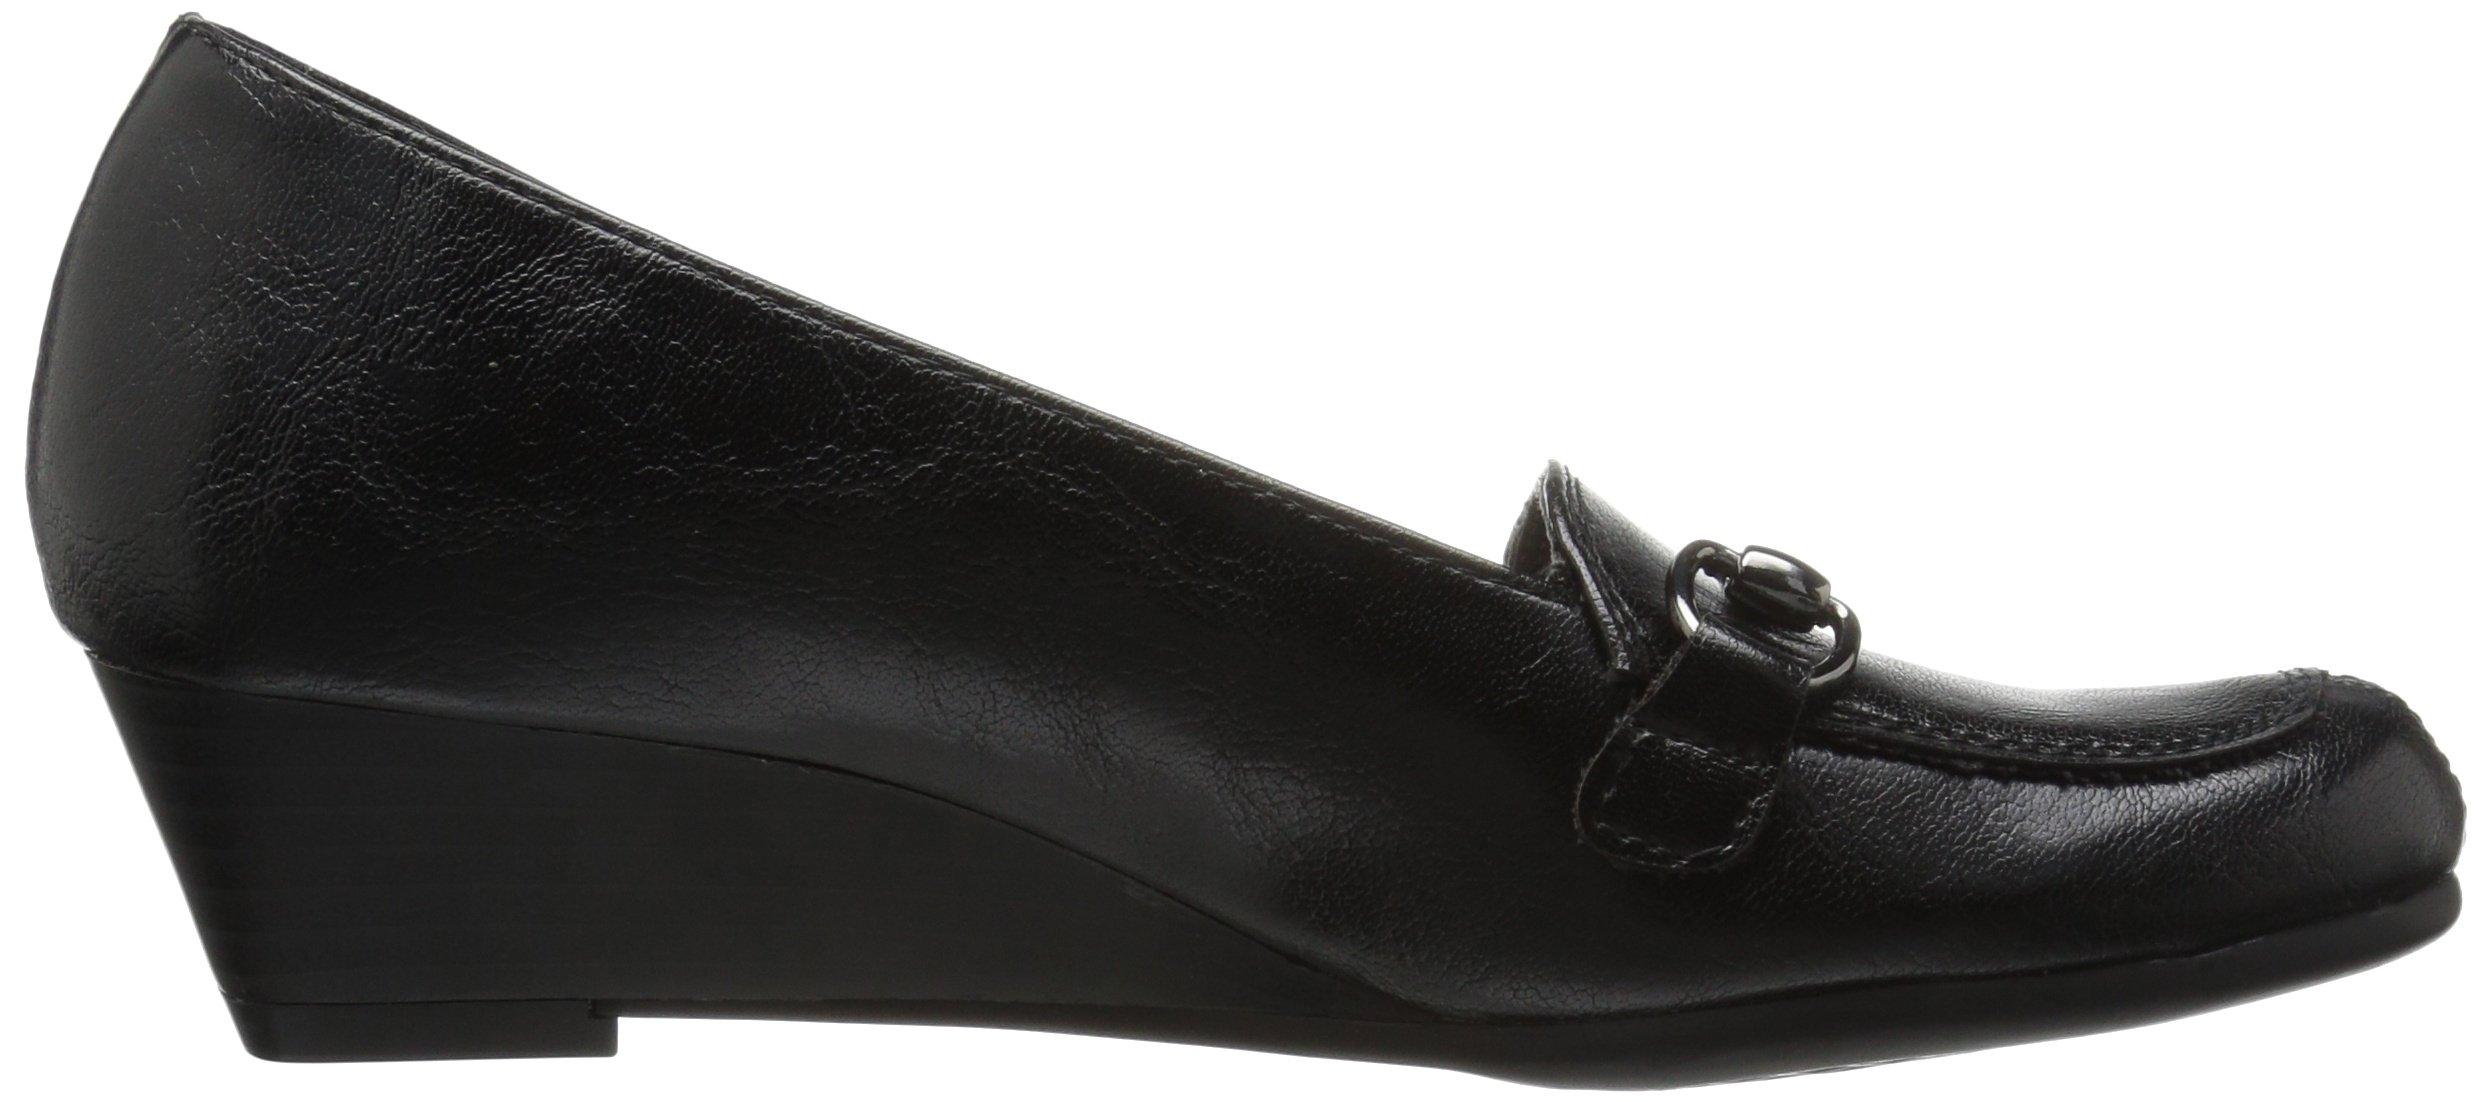 Aerosoles A2 by Women's Love Spell Slip-on Loafer, Black, 8 M US by Aerosoles (Image #7)